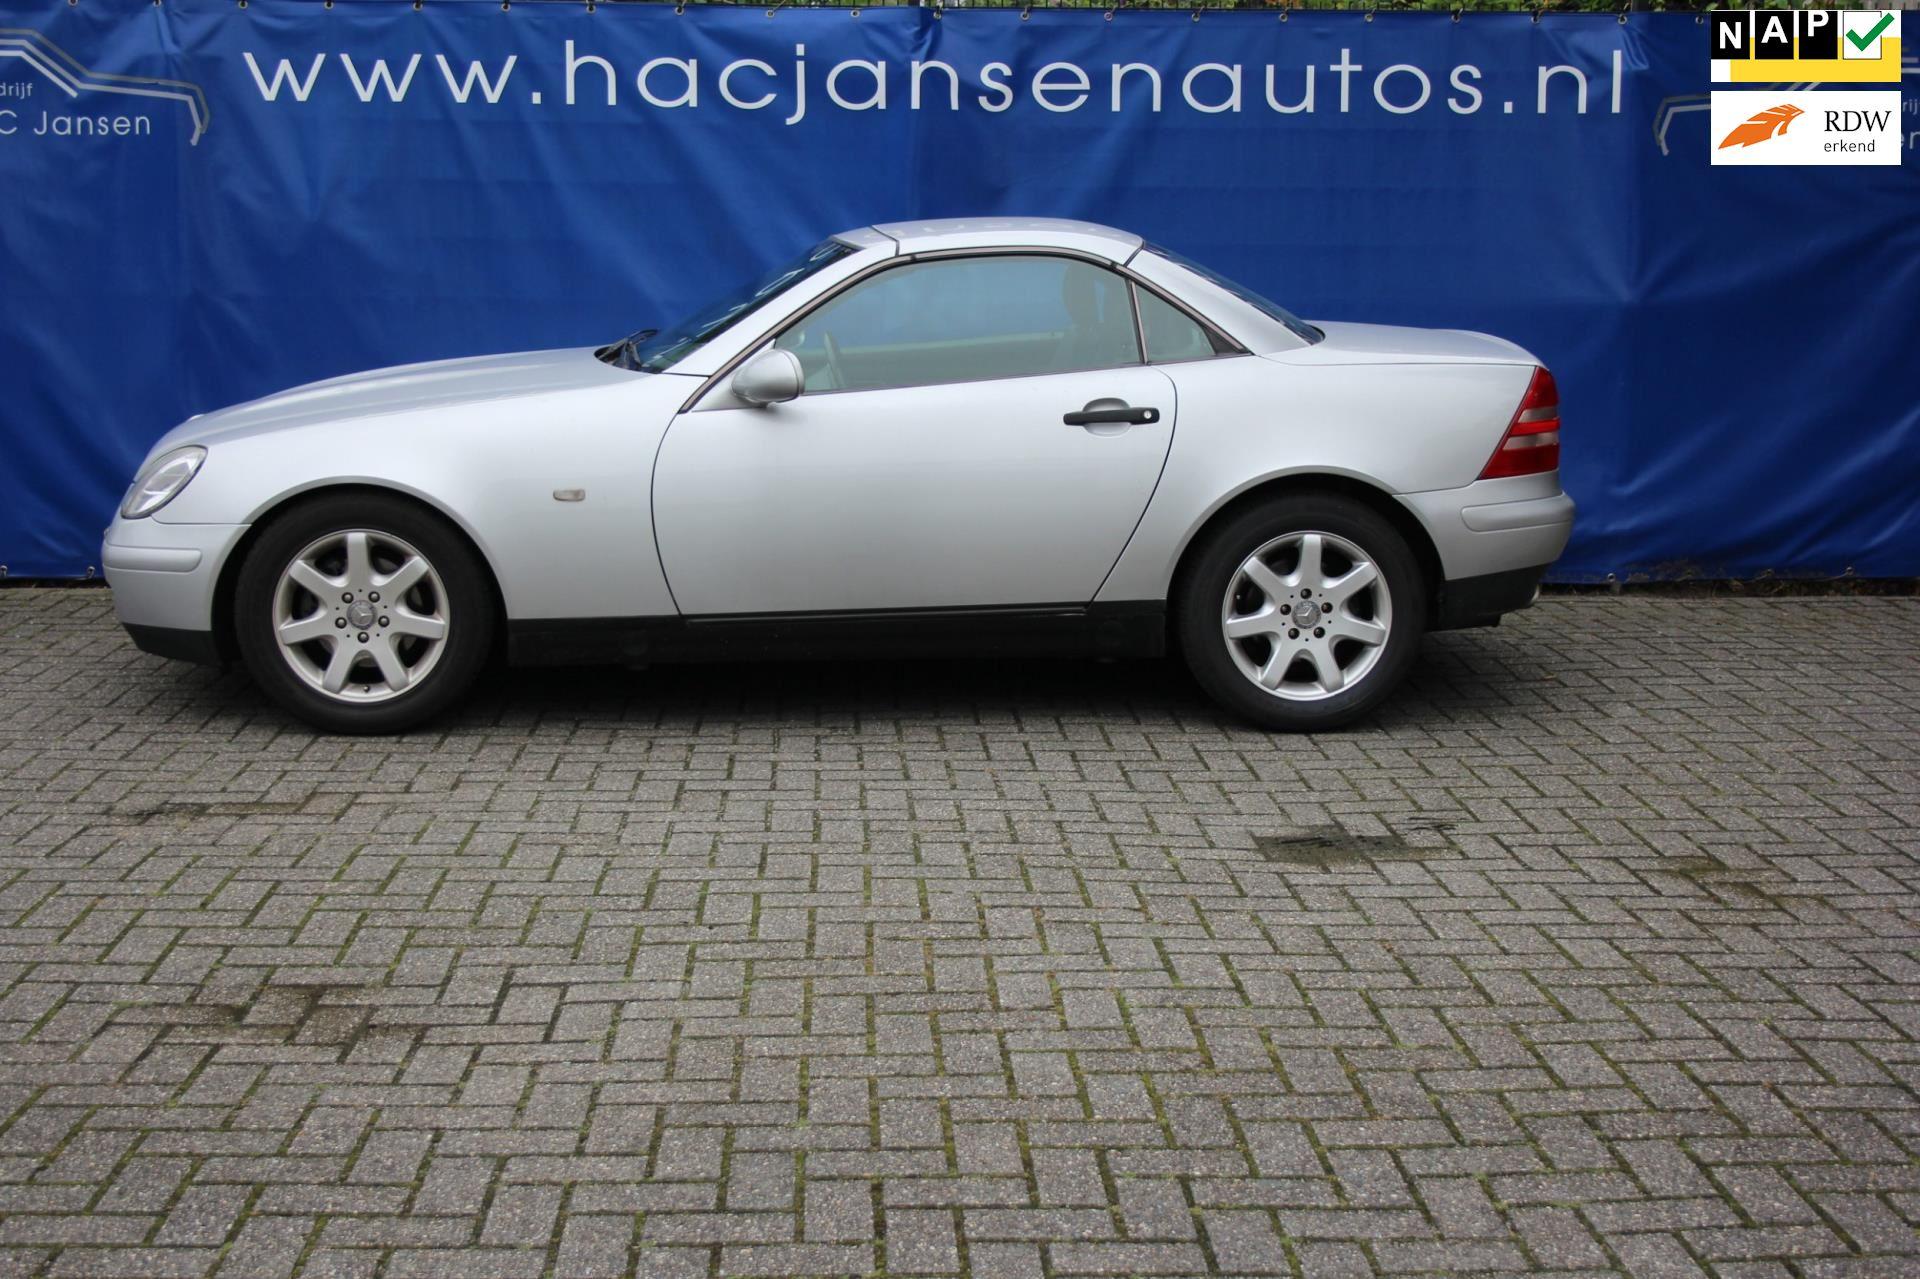 Mercedes-Benz SLK-klasse occasion - Autobedr. VOF HAC Jansen